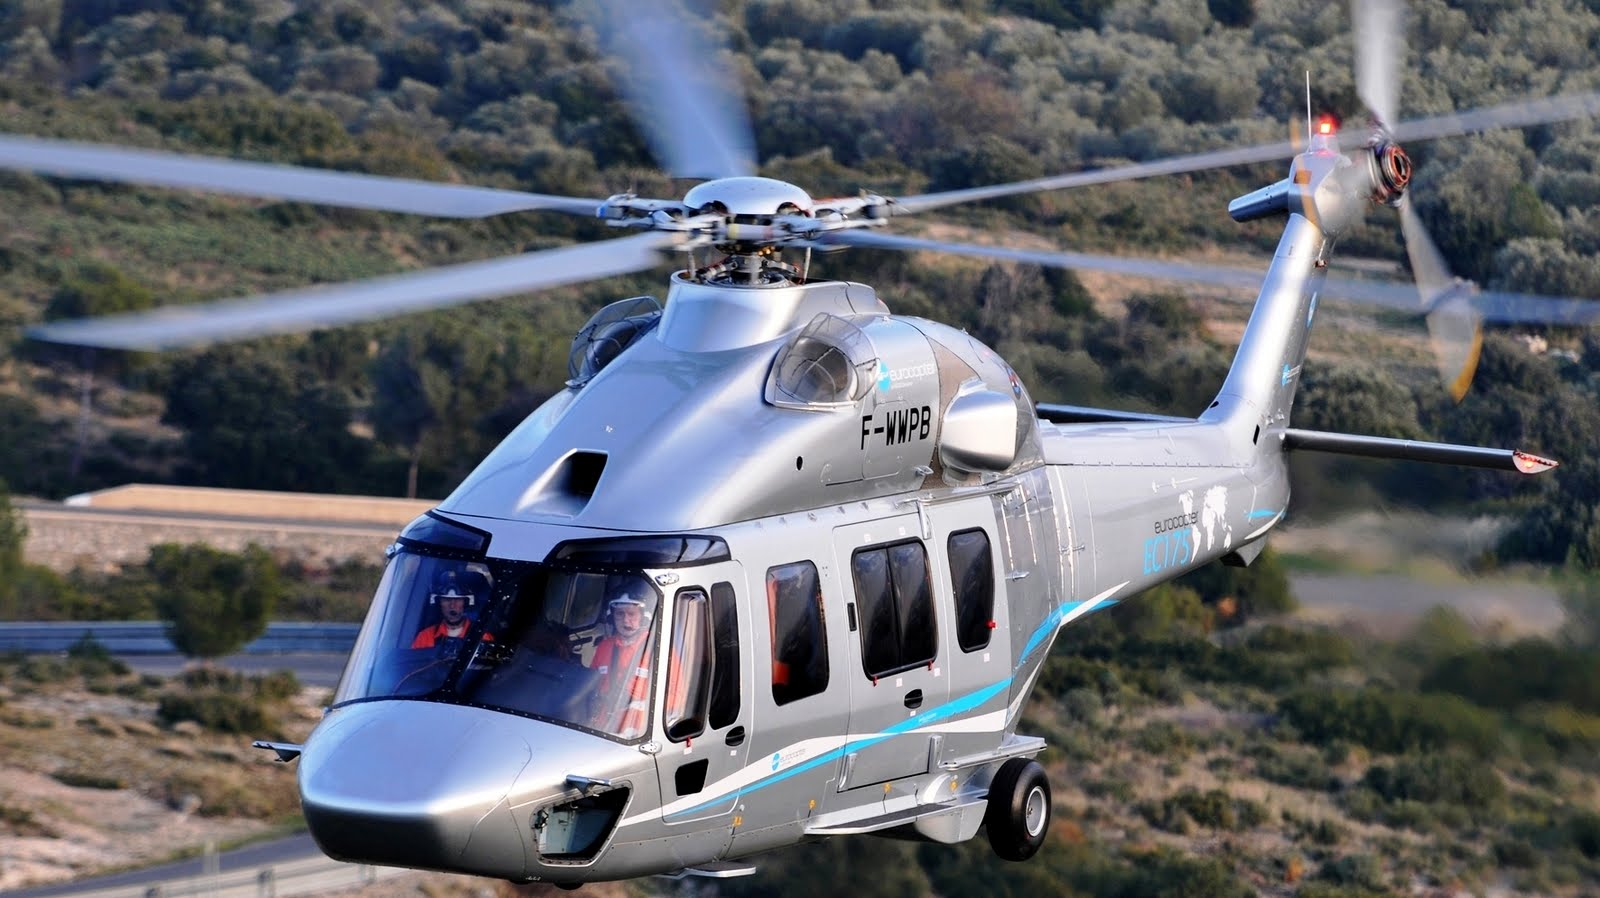 http://4.bp.blogspot.com/-Kf-gL6VzZGA/TiWuORE8GPI/AAAAAAAAF9I/ARHf2cETBus/s1600/eurocopter_ec_175_48761_aircraft-wallpaper.JPG